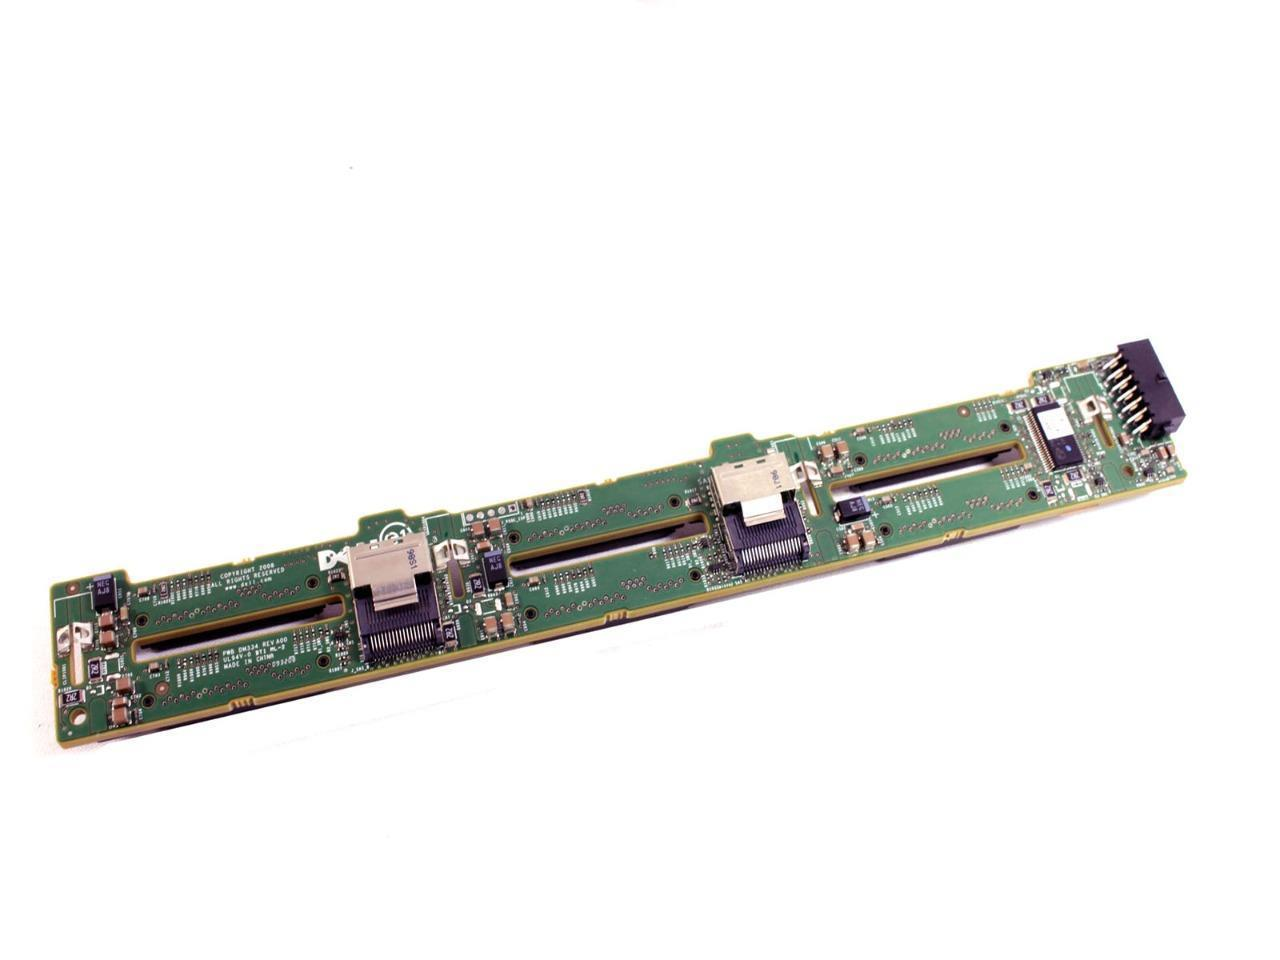 DELL POWEREDGE R610 SERVER SAS X6 BACKPLANE BOARD KM779 D109N MX840 W903M